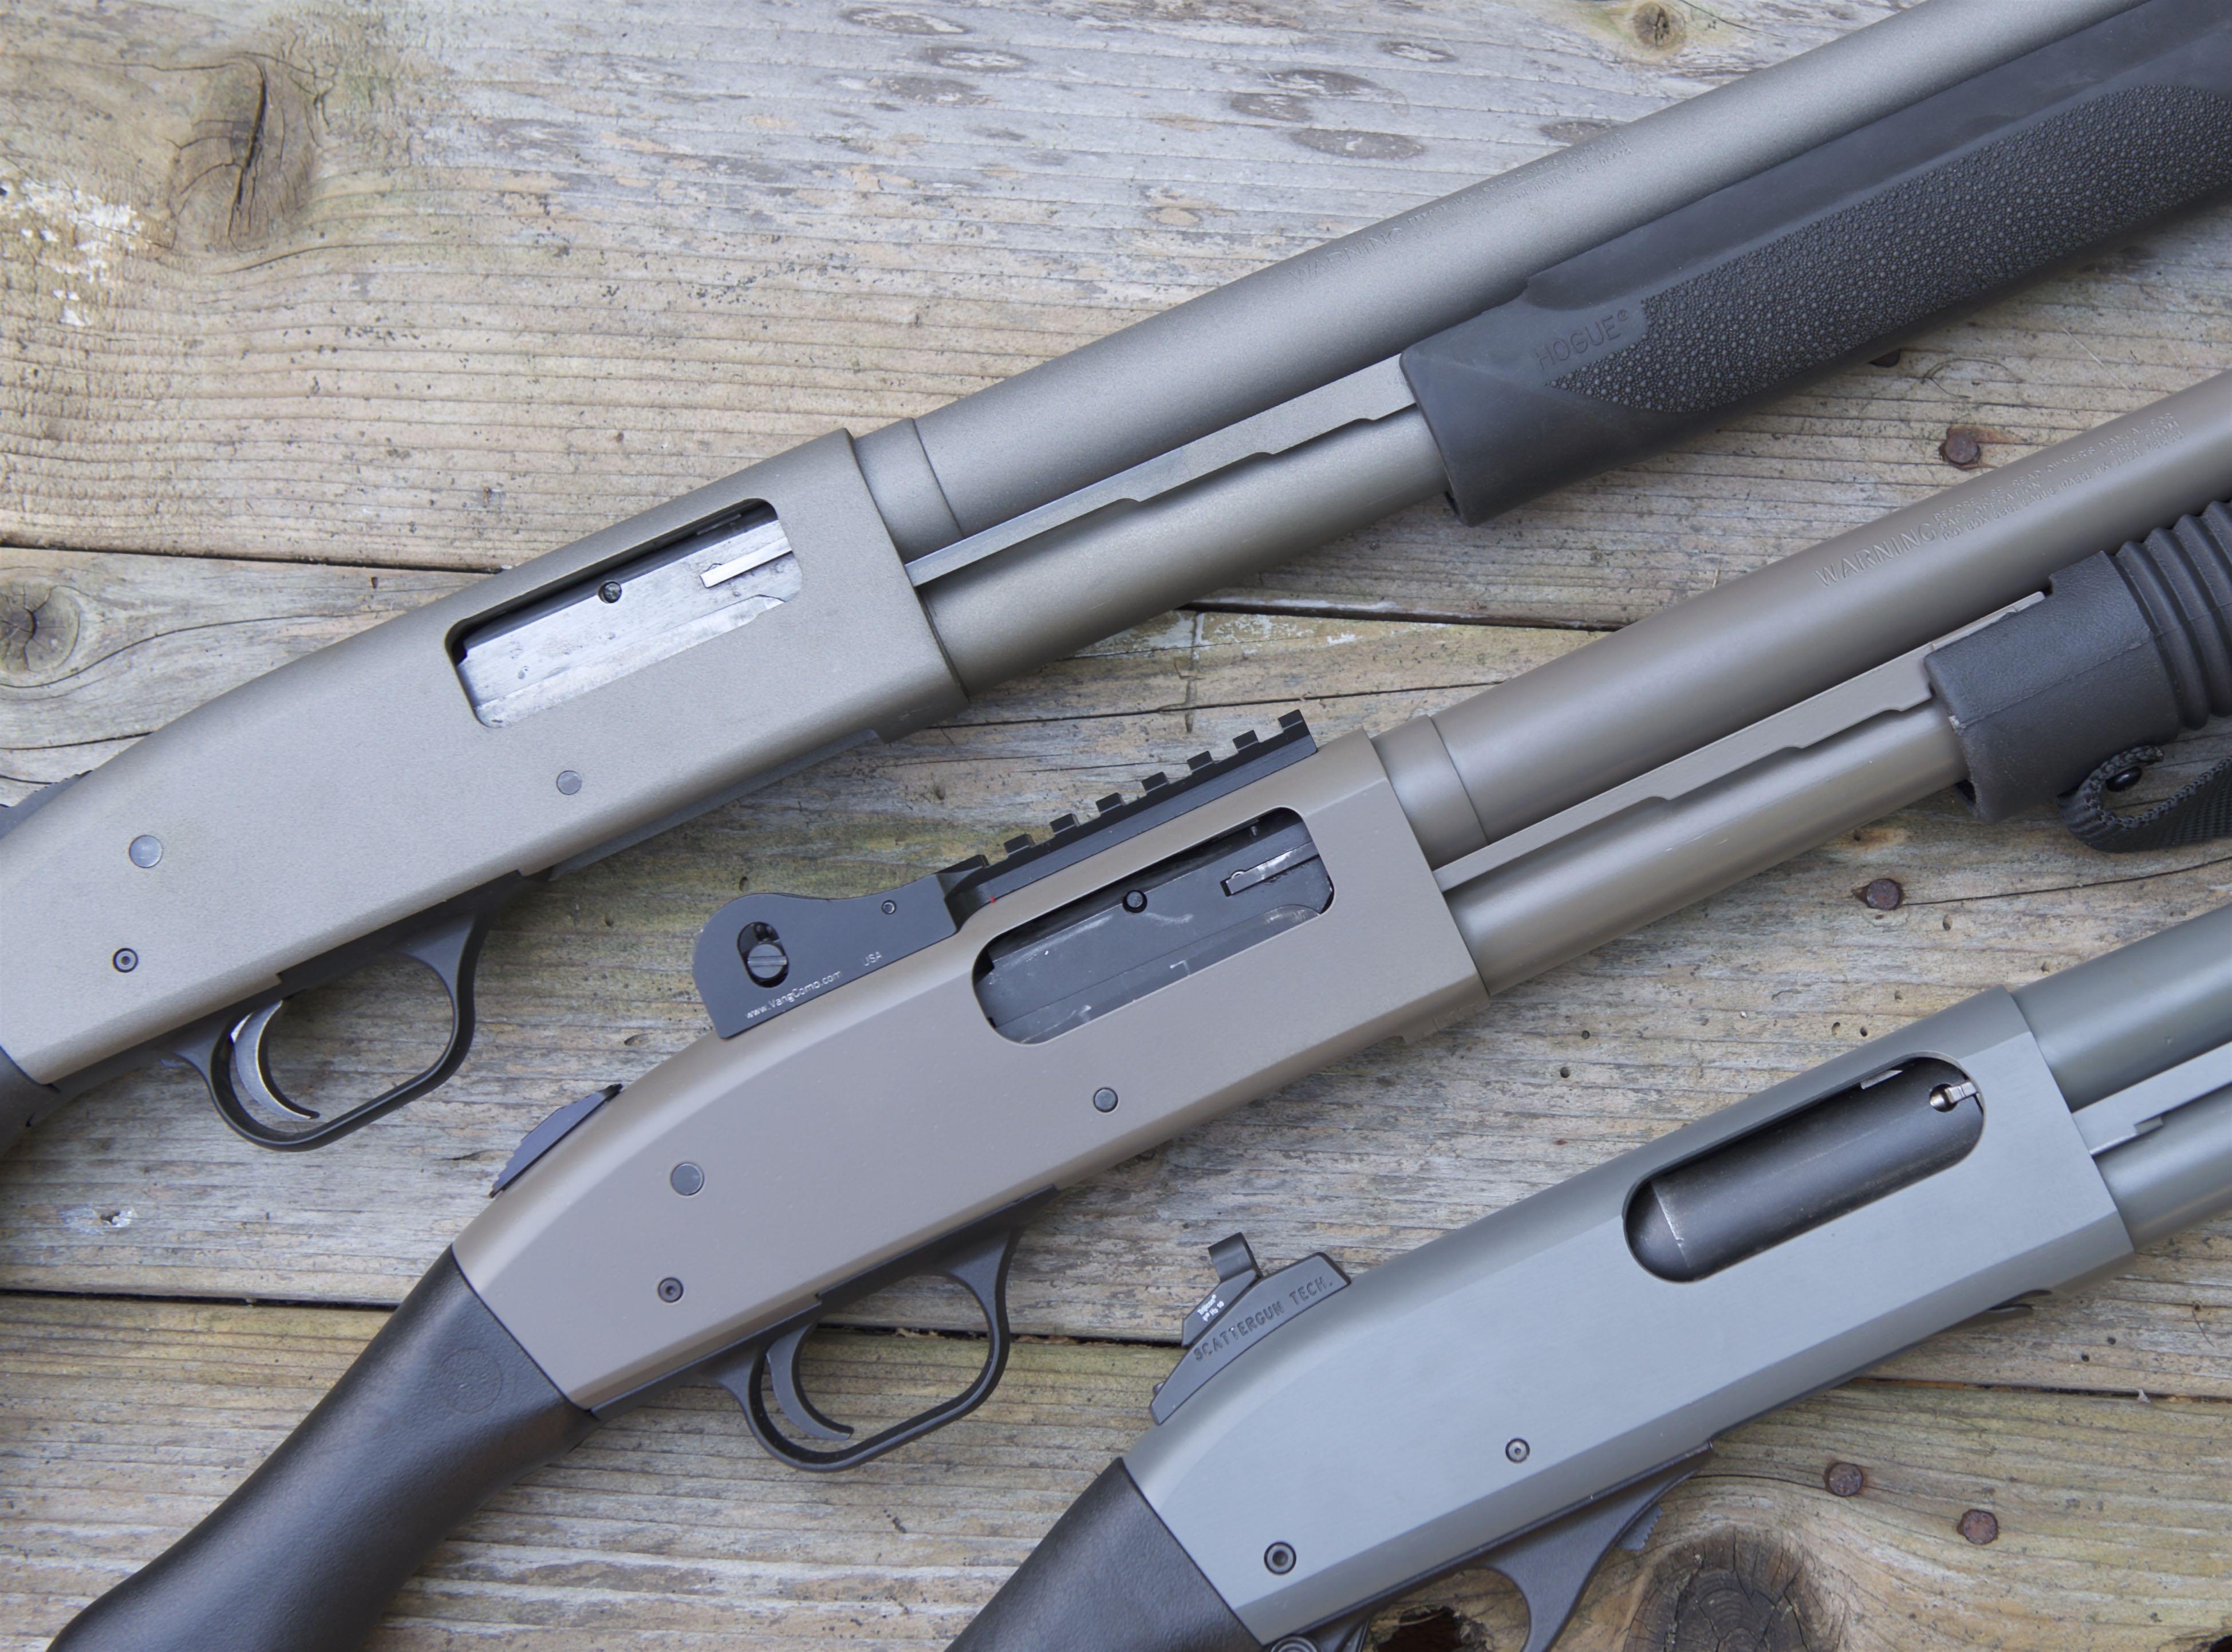 remington 870 v mossberg 500 v mossberg 590 comparative design rh rifleshooter com Mossberg 500 Disassembly Guide-Free Mossberg 500A 12 Gauge Manual